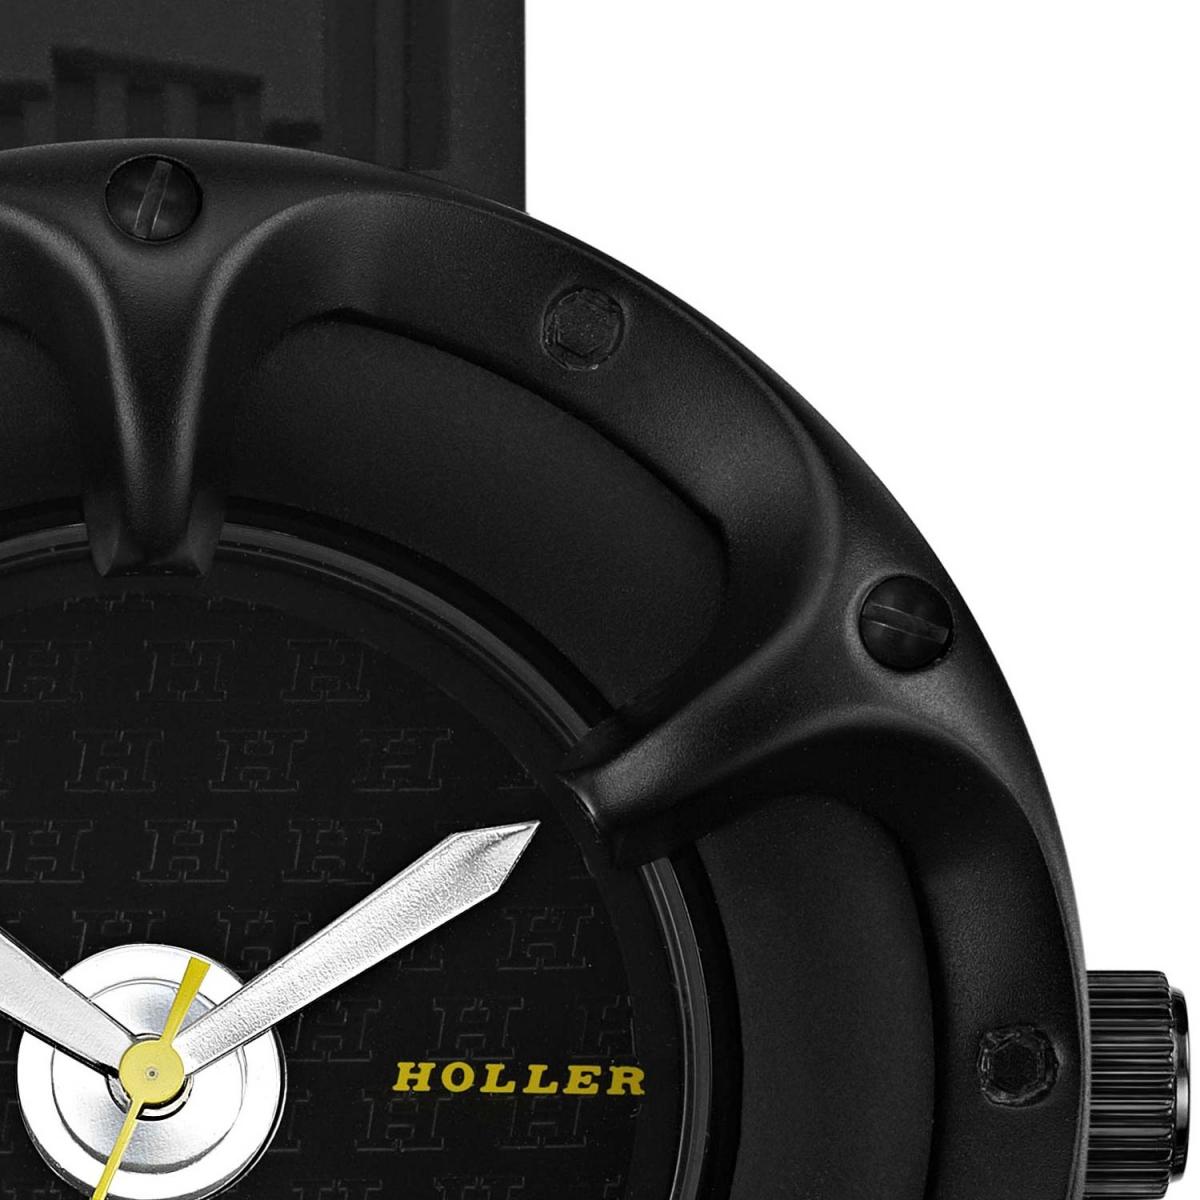 Holler Golden World Black Watch